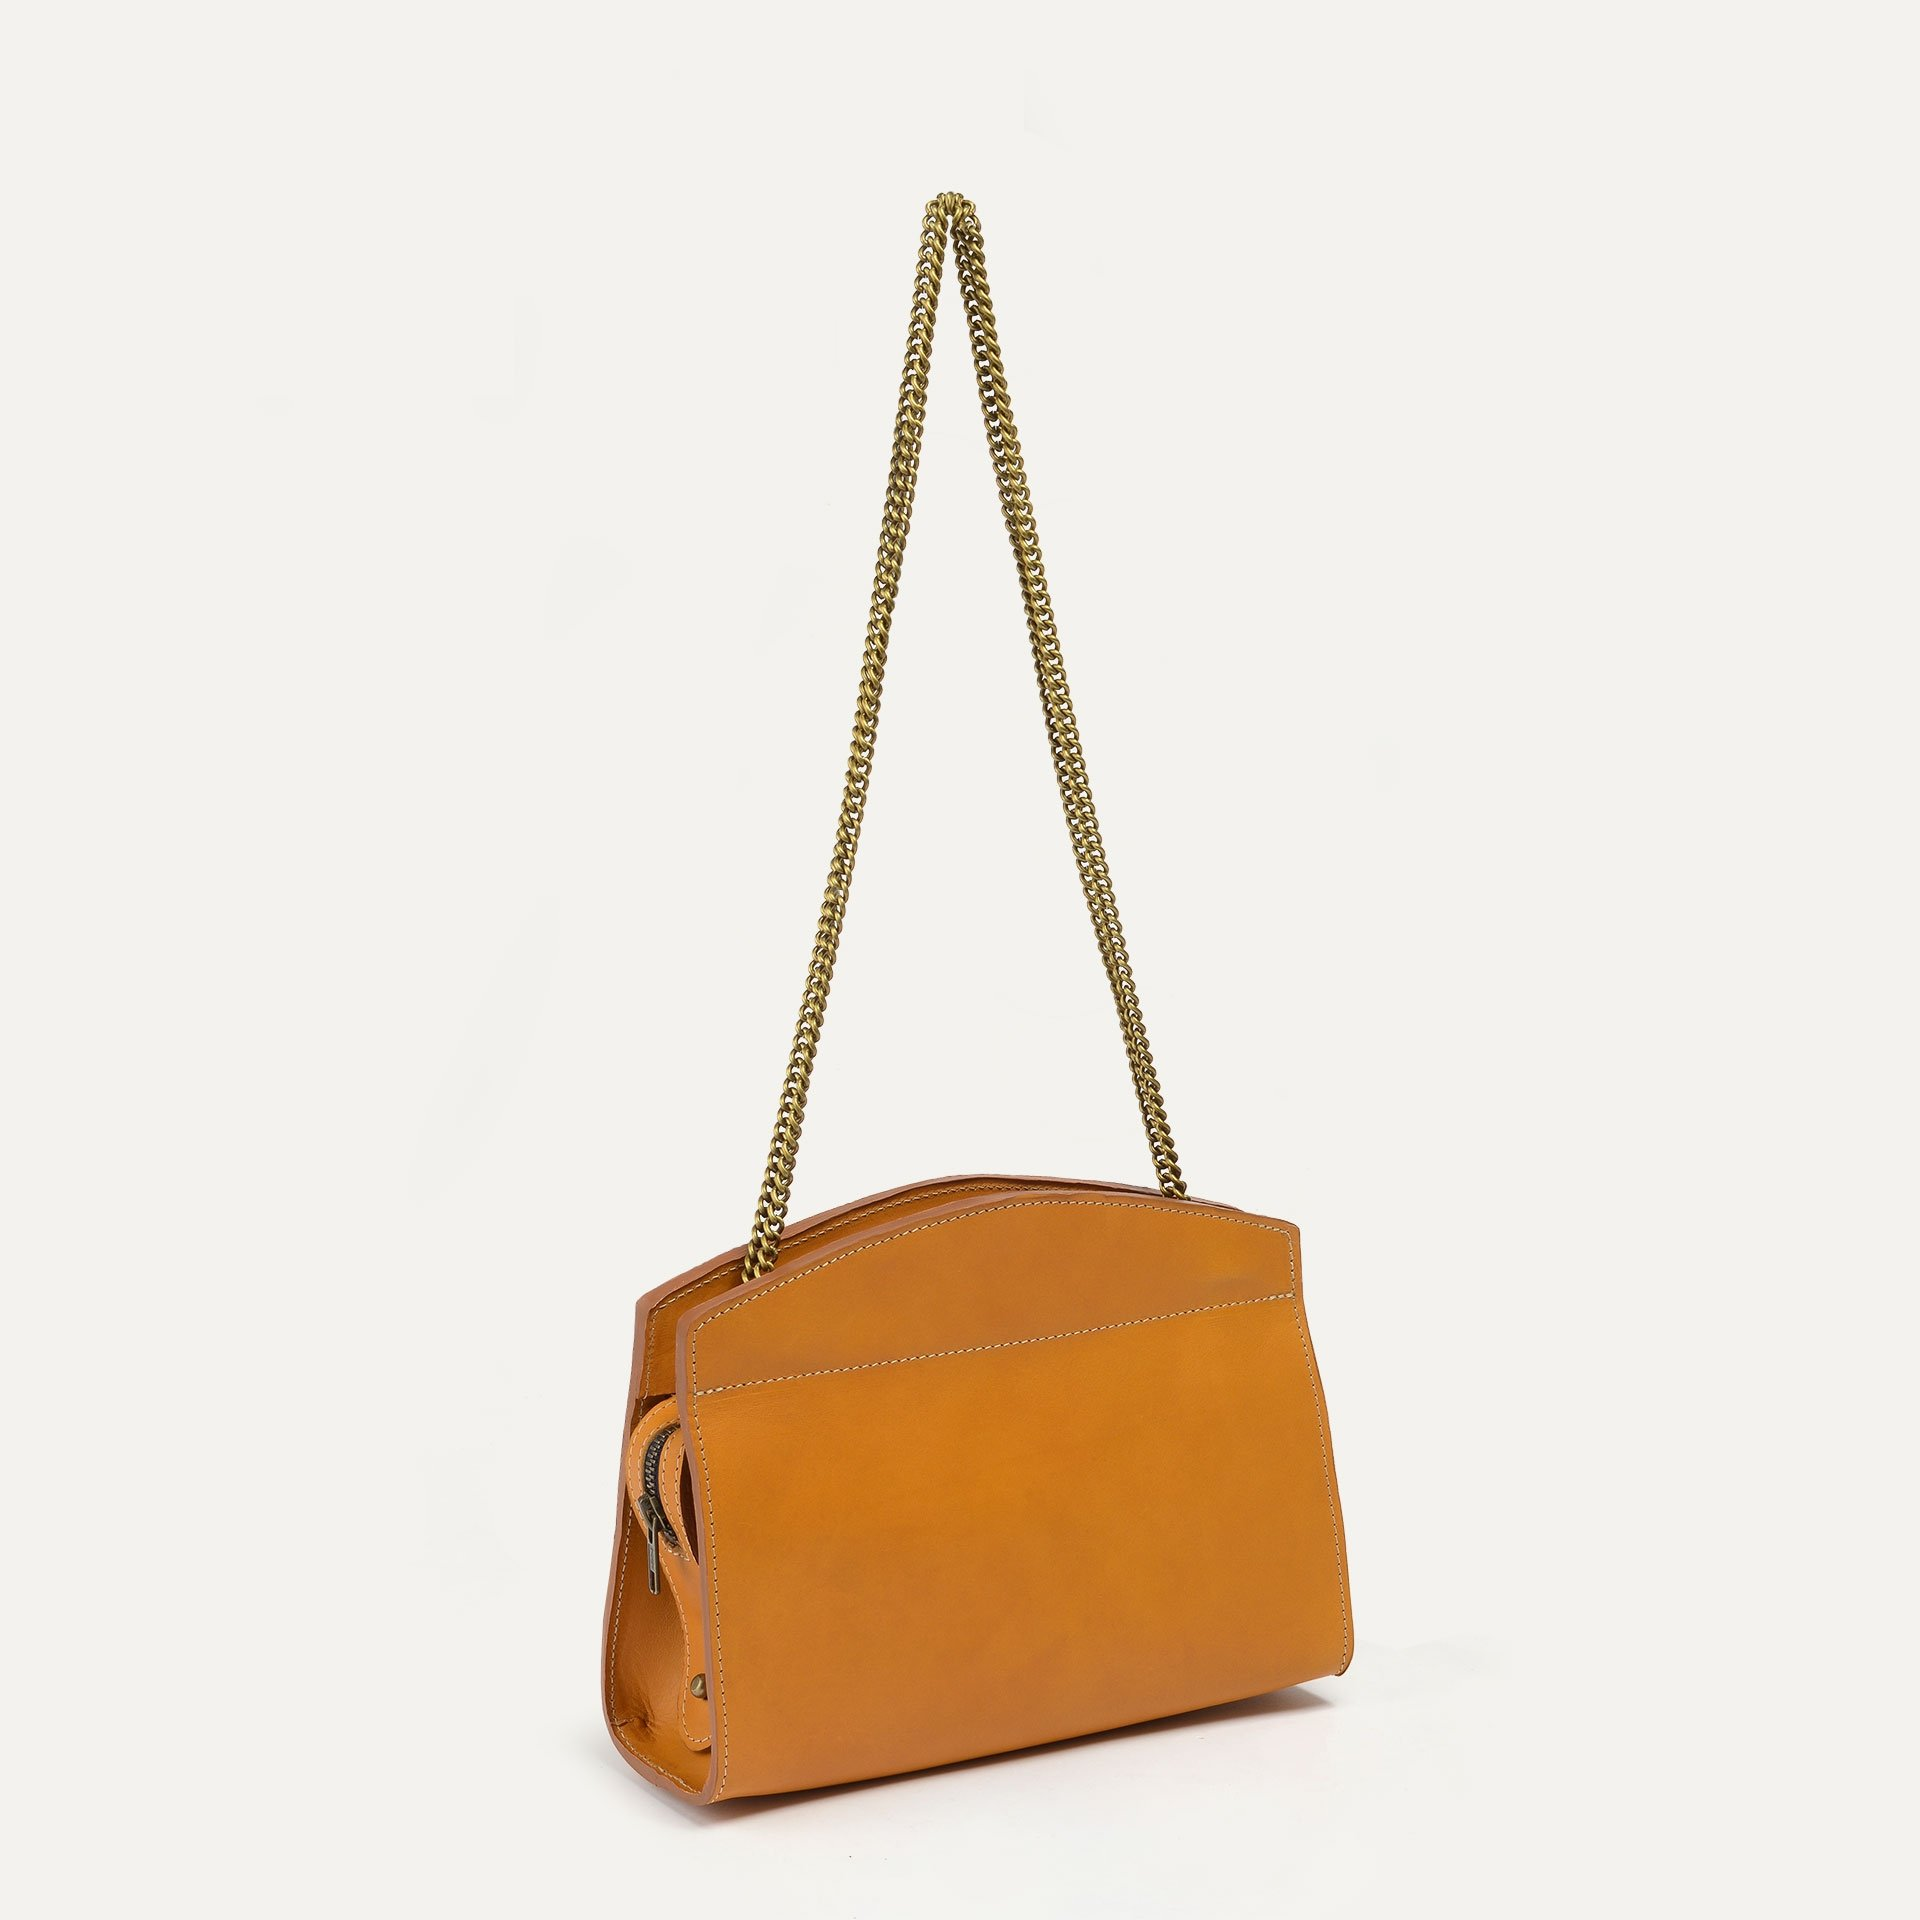 Origami S Zipped clutch bag - Honey (image n°2)